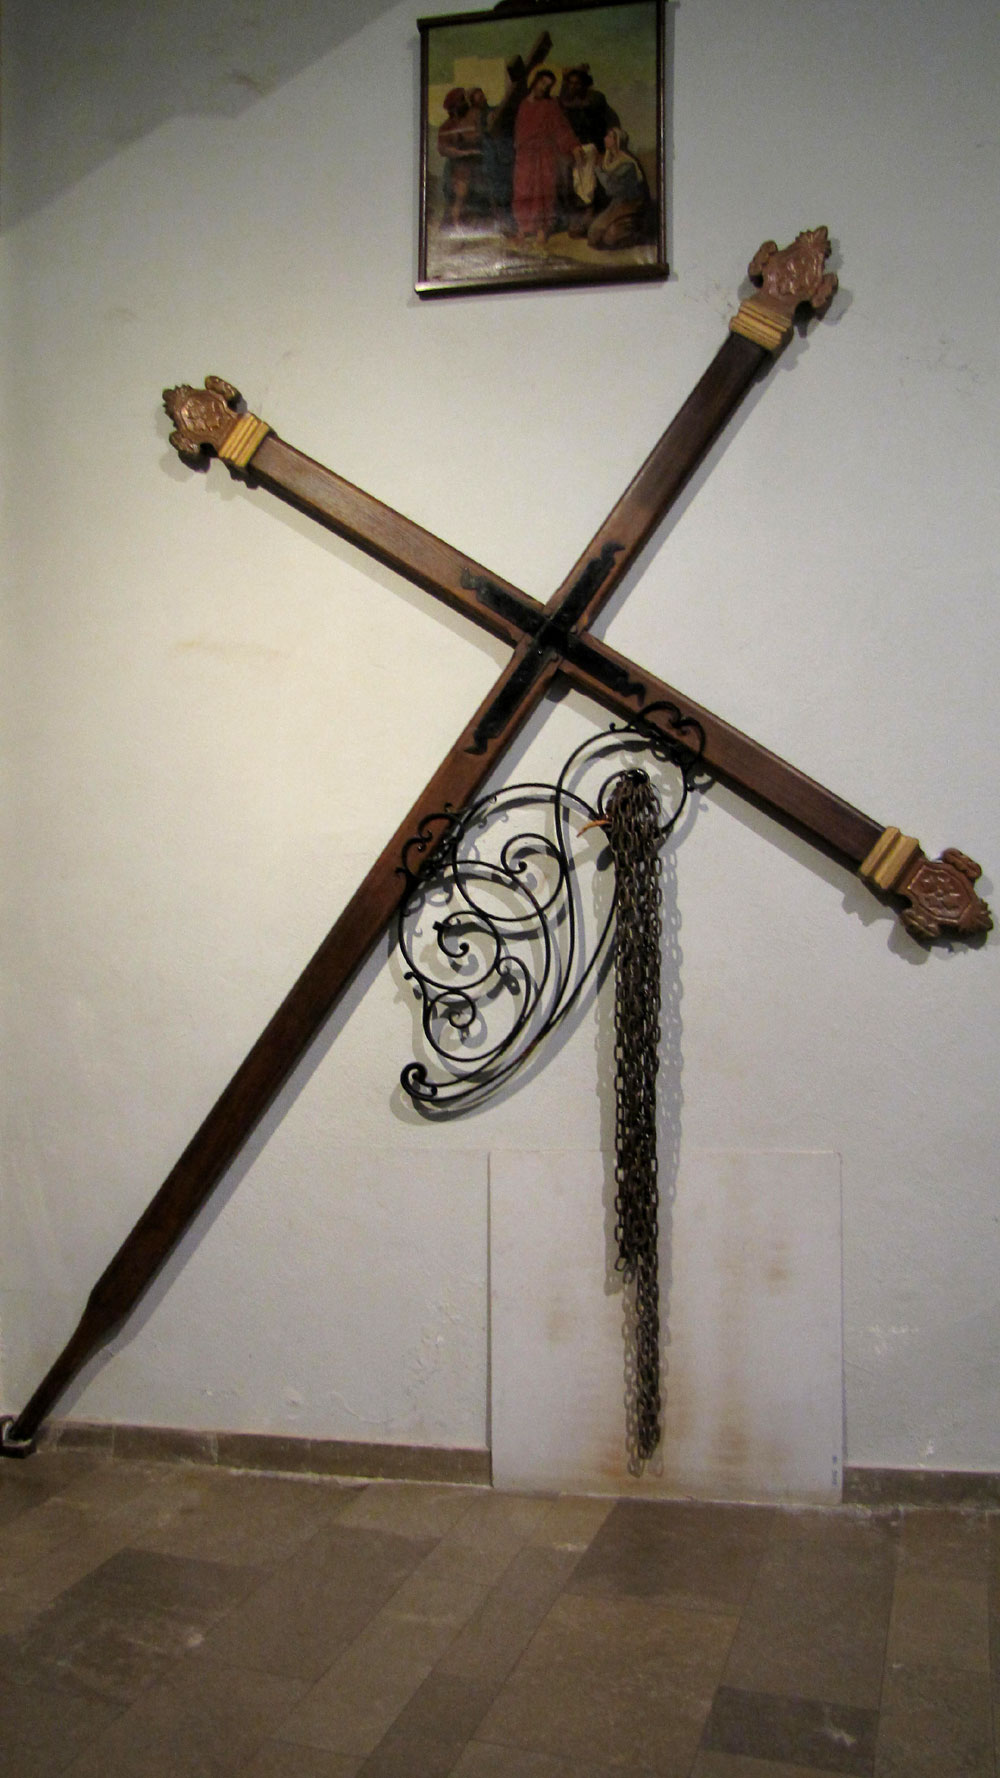 Croix et chaînes du Catenacciu